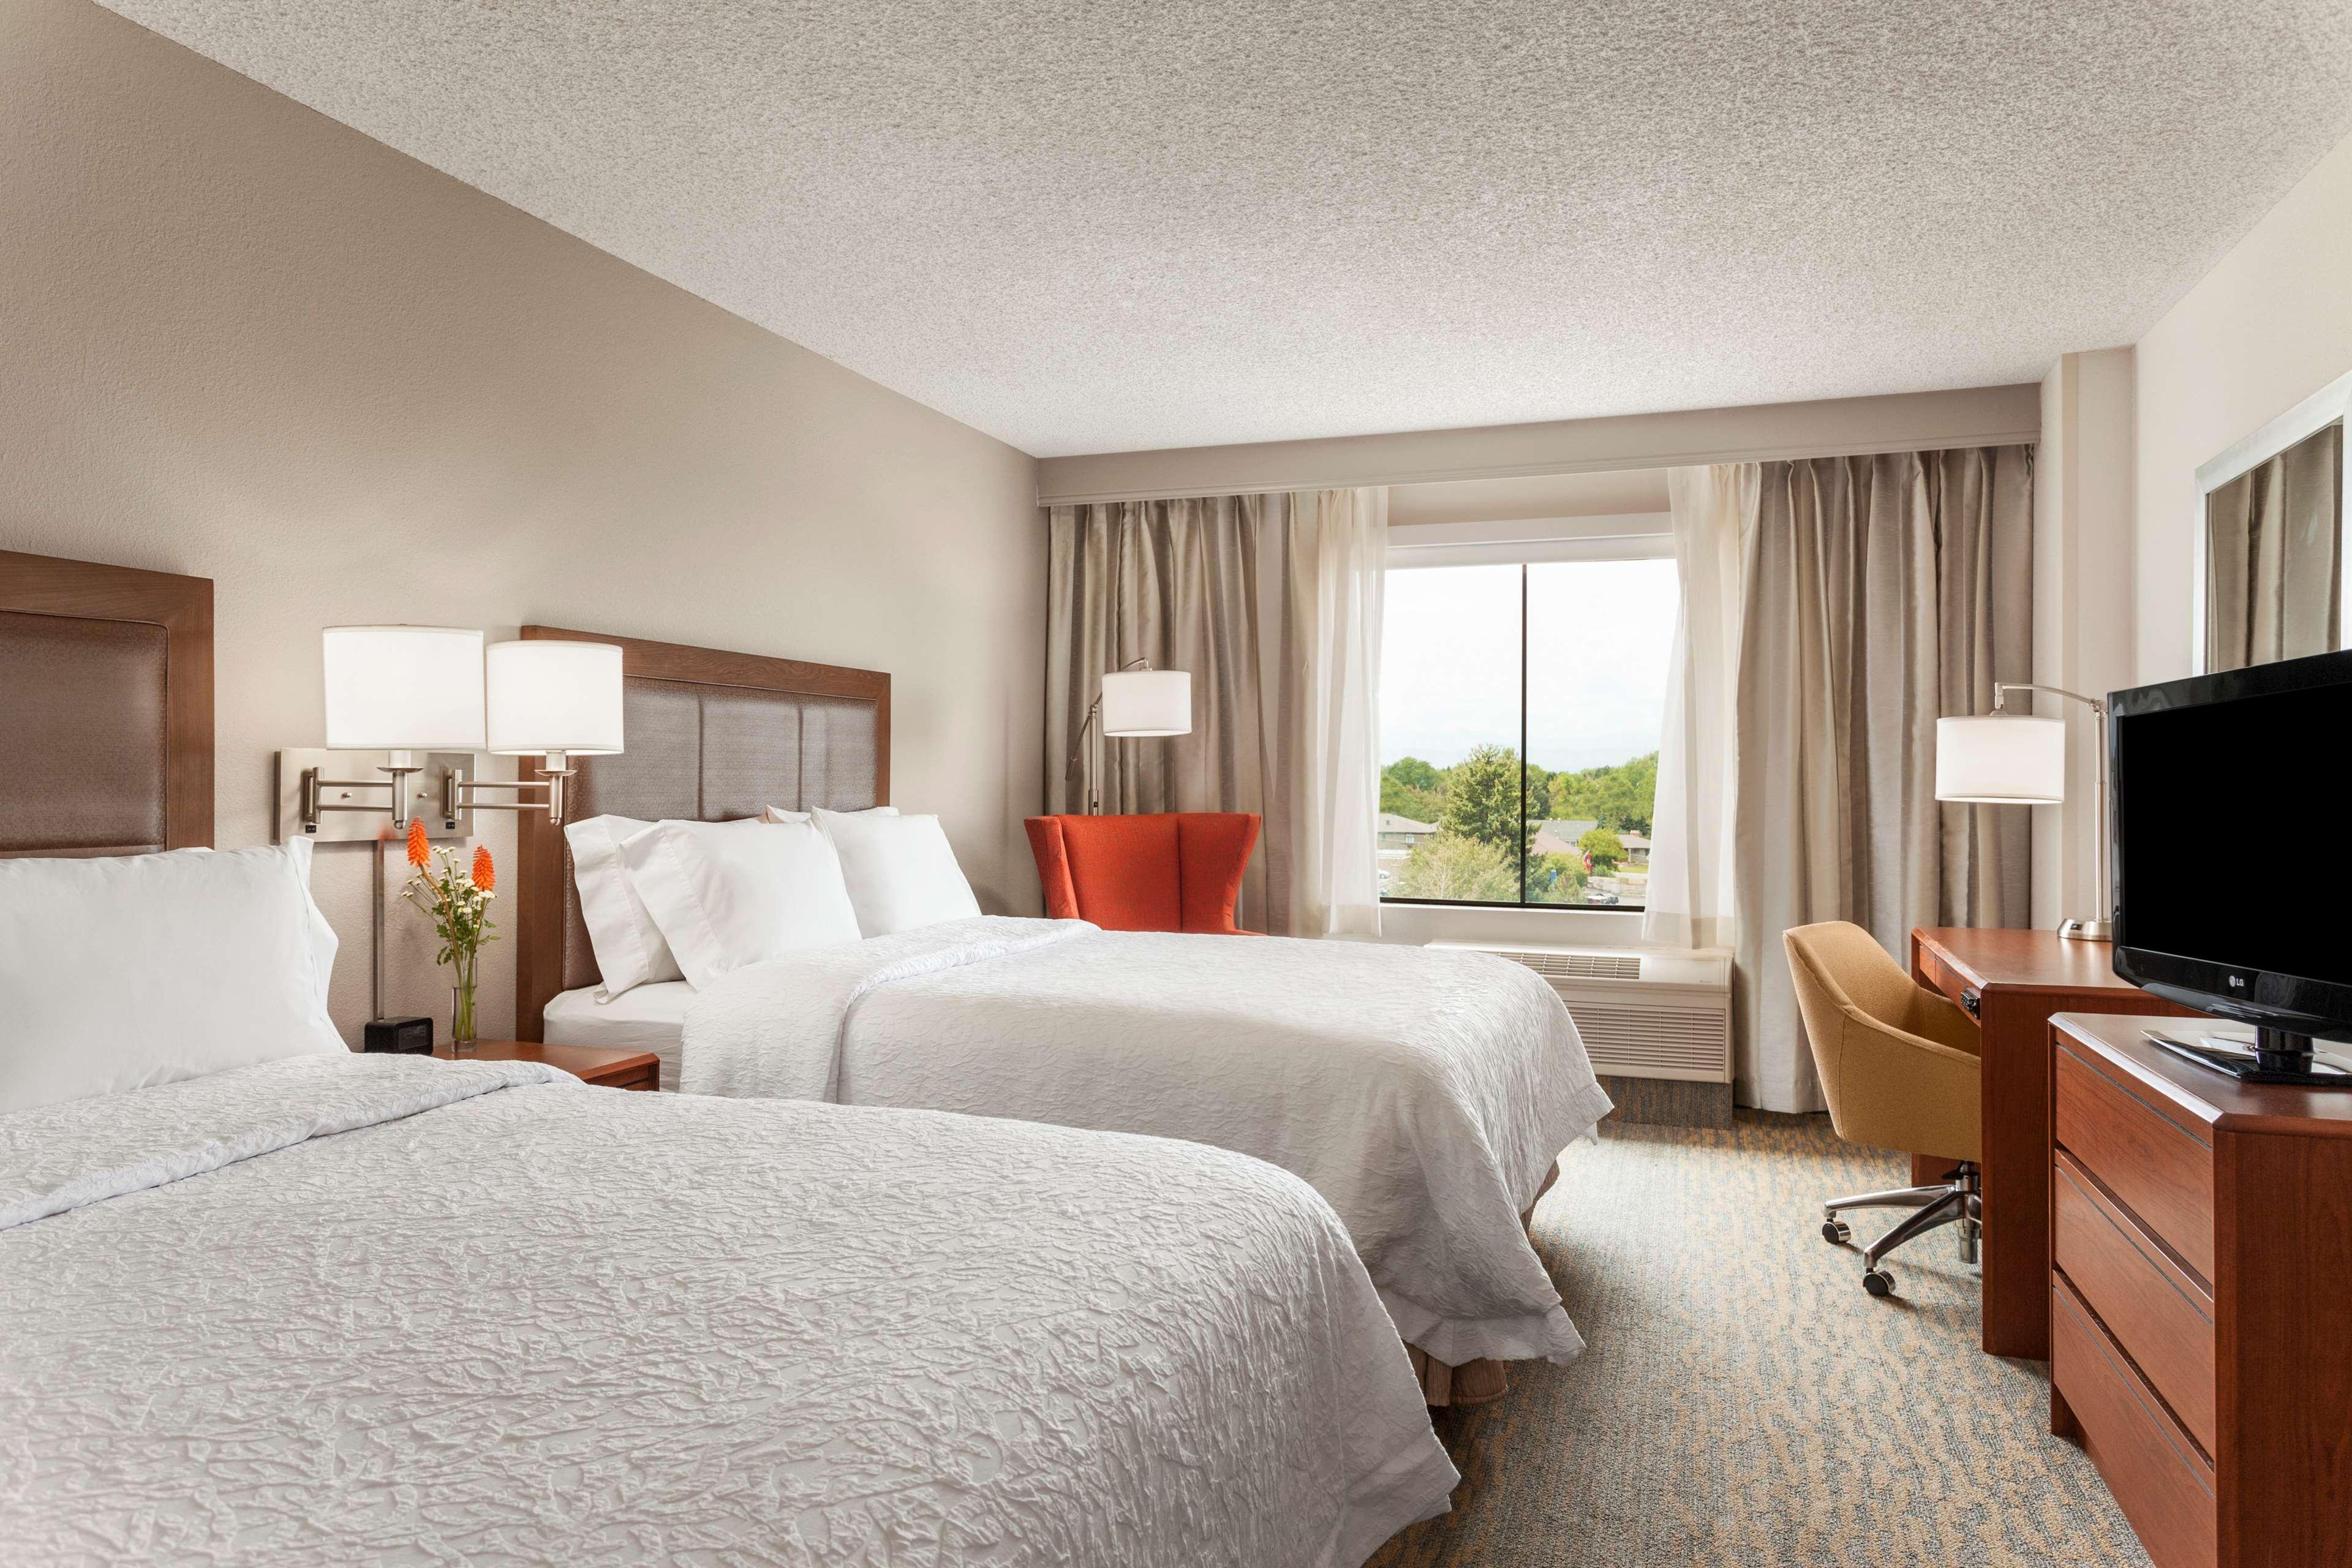 Hampton Inn & Suites Denver-Cherry Creek image 20